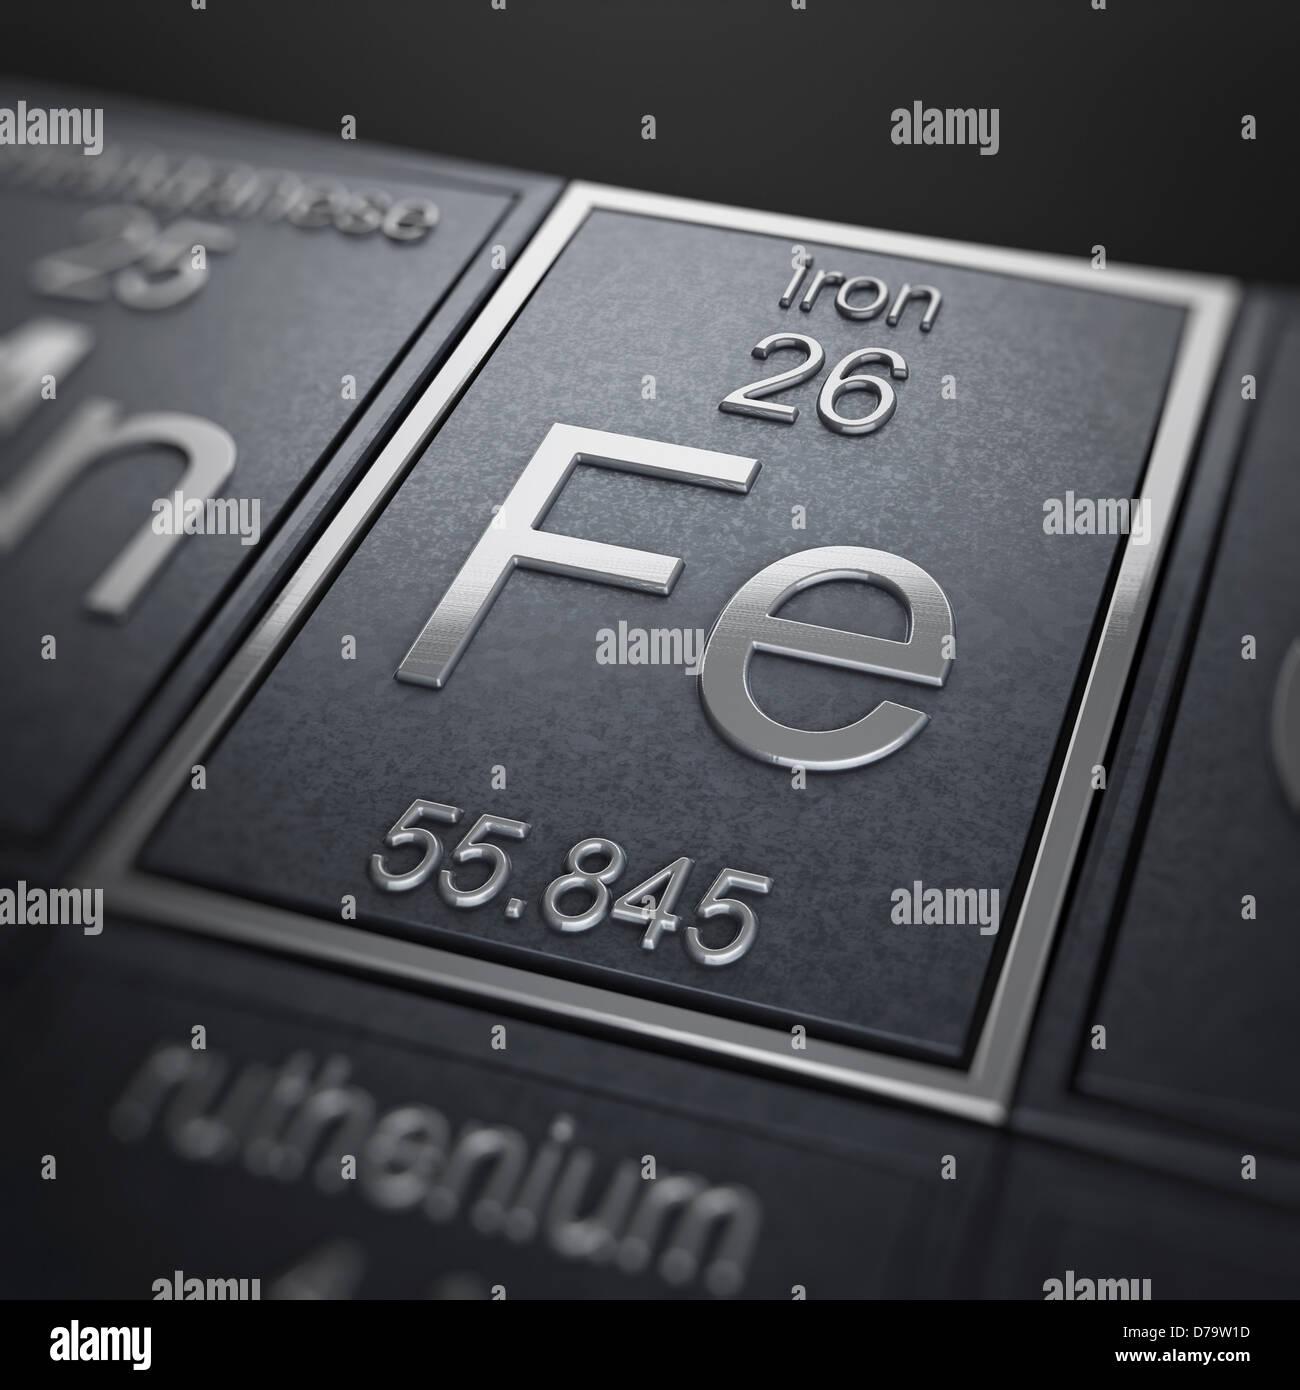 Iron Chemical Element Stock Photos Iron Chemical Element Stock